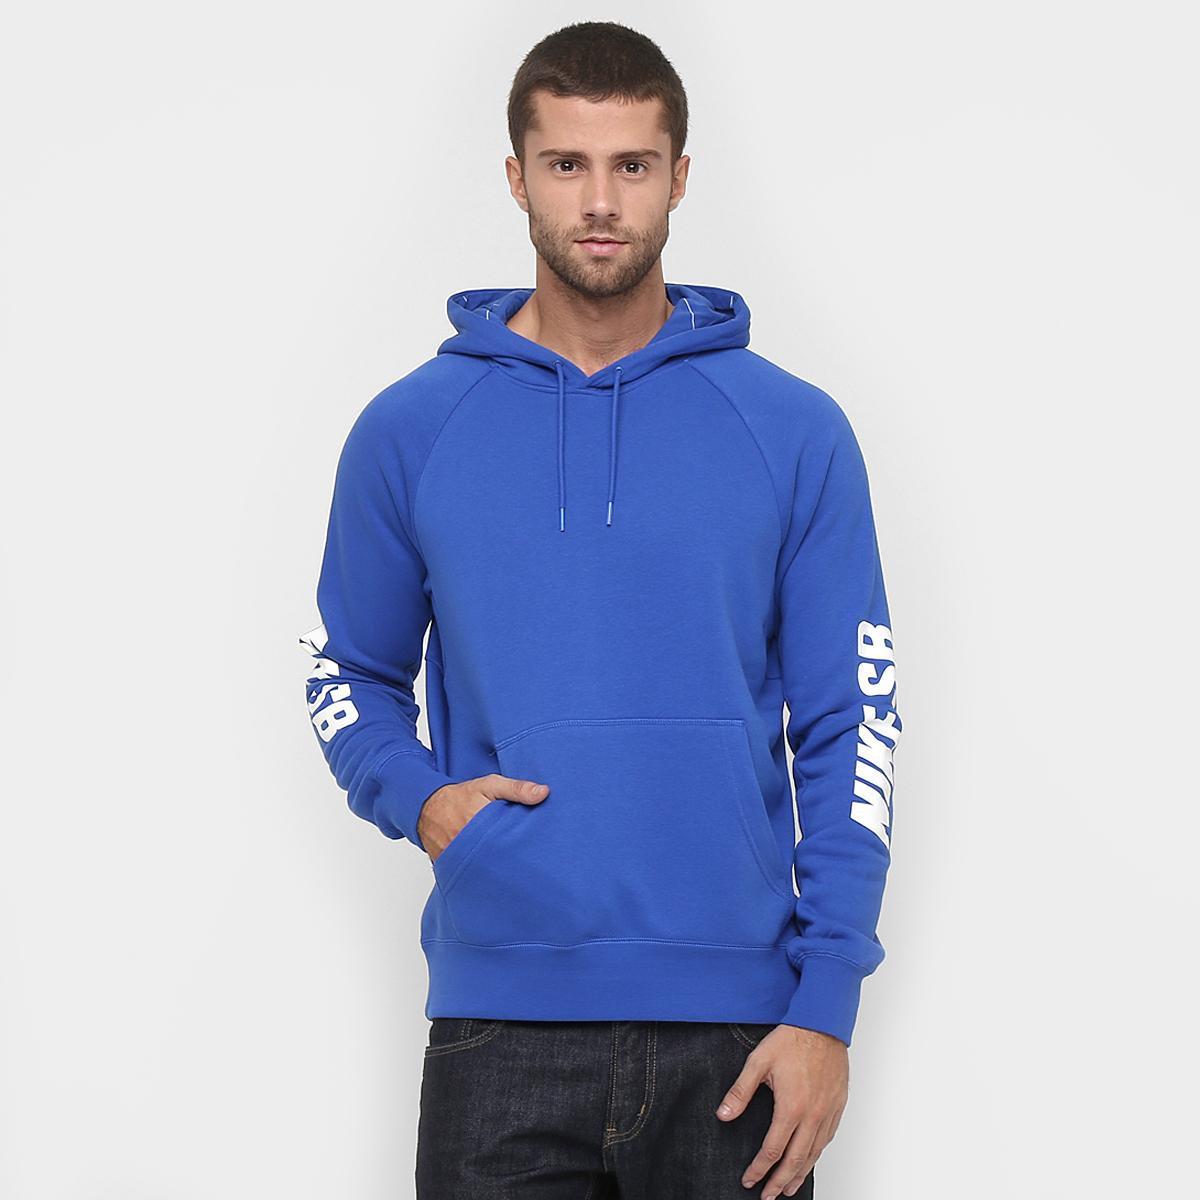 b94e13f78e Moletom Nike SB Icon Yarn Dye Masculino - Compre Agora